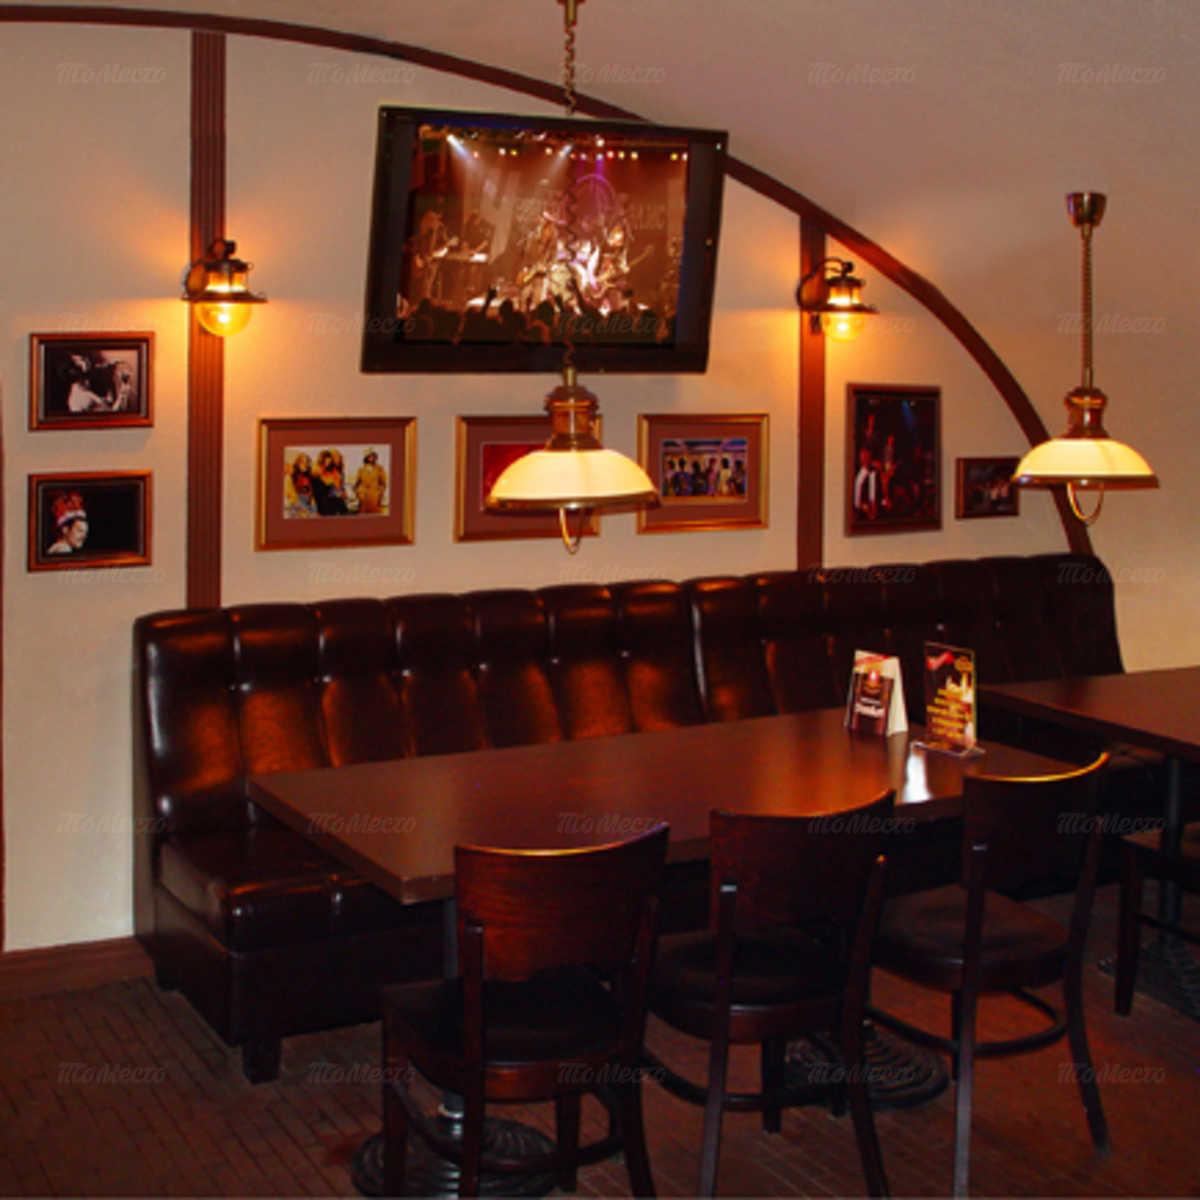 Паб Рок паб (Rock Pub) на Невском проспекте фото 7